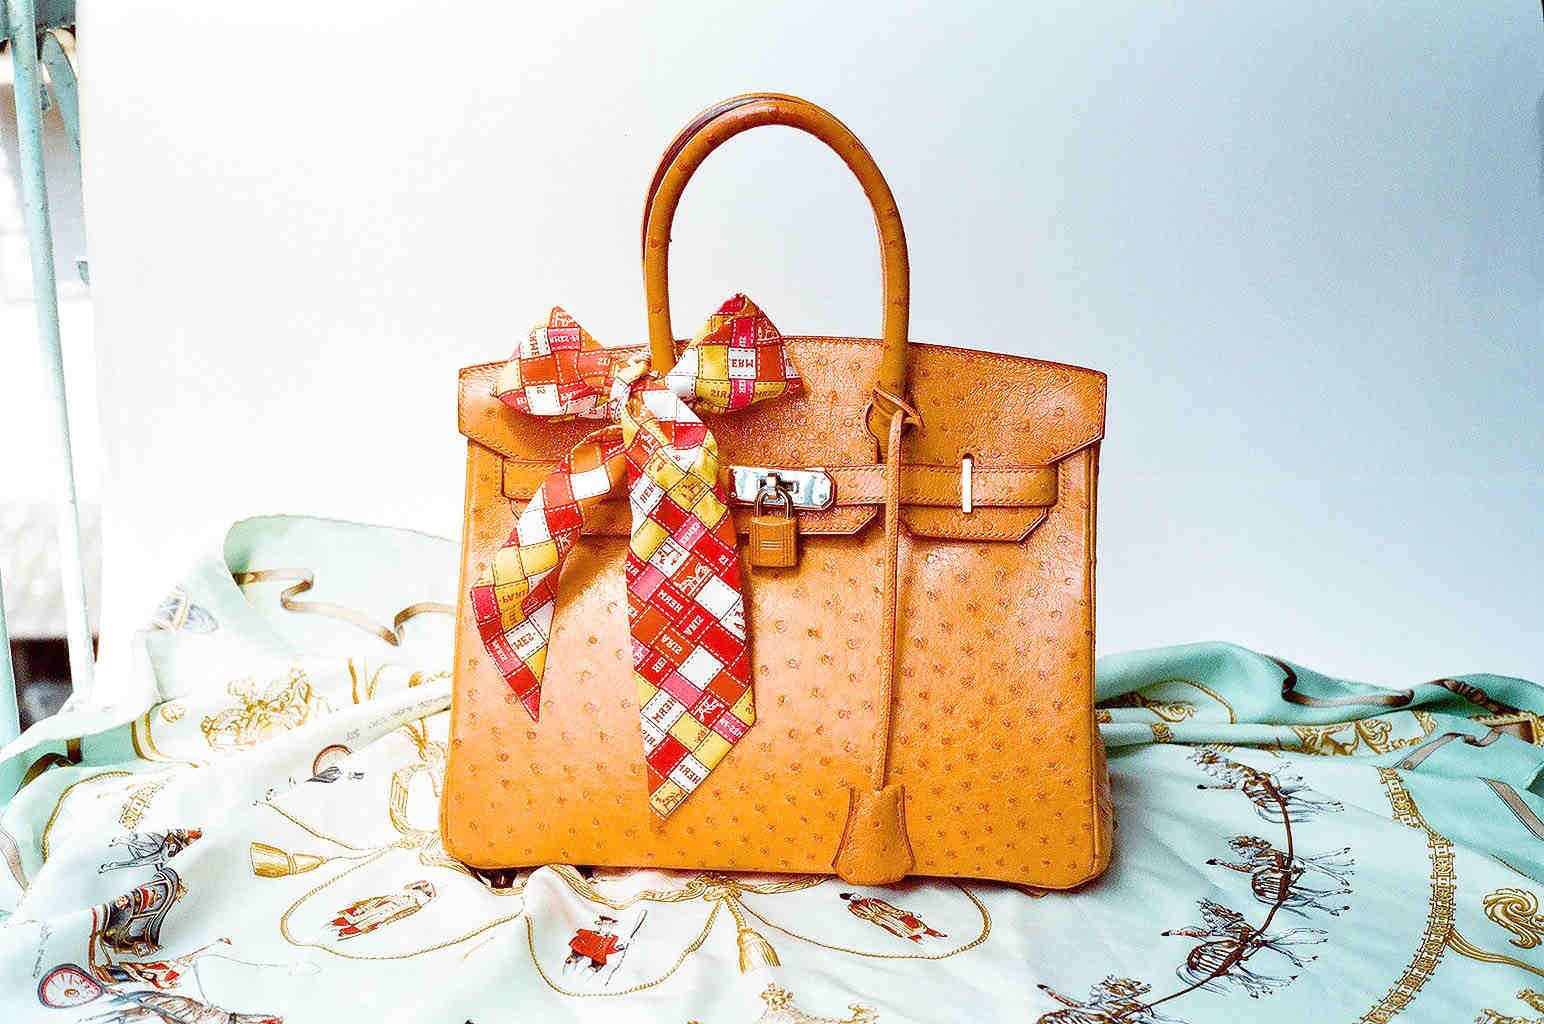 Quel est le prix d'un sac Hermès Birkin?